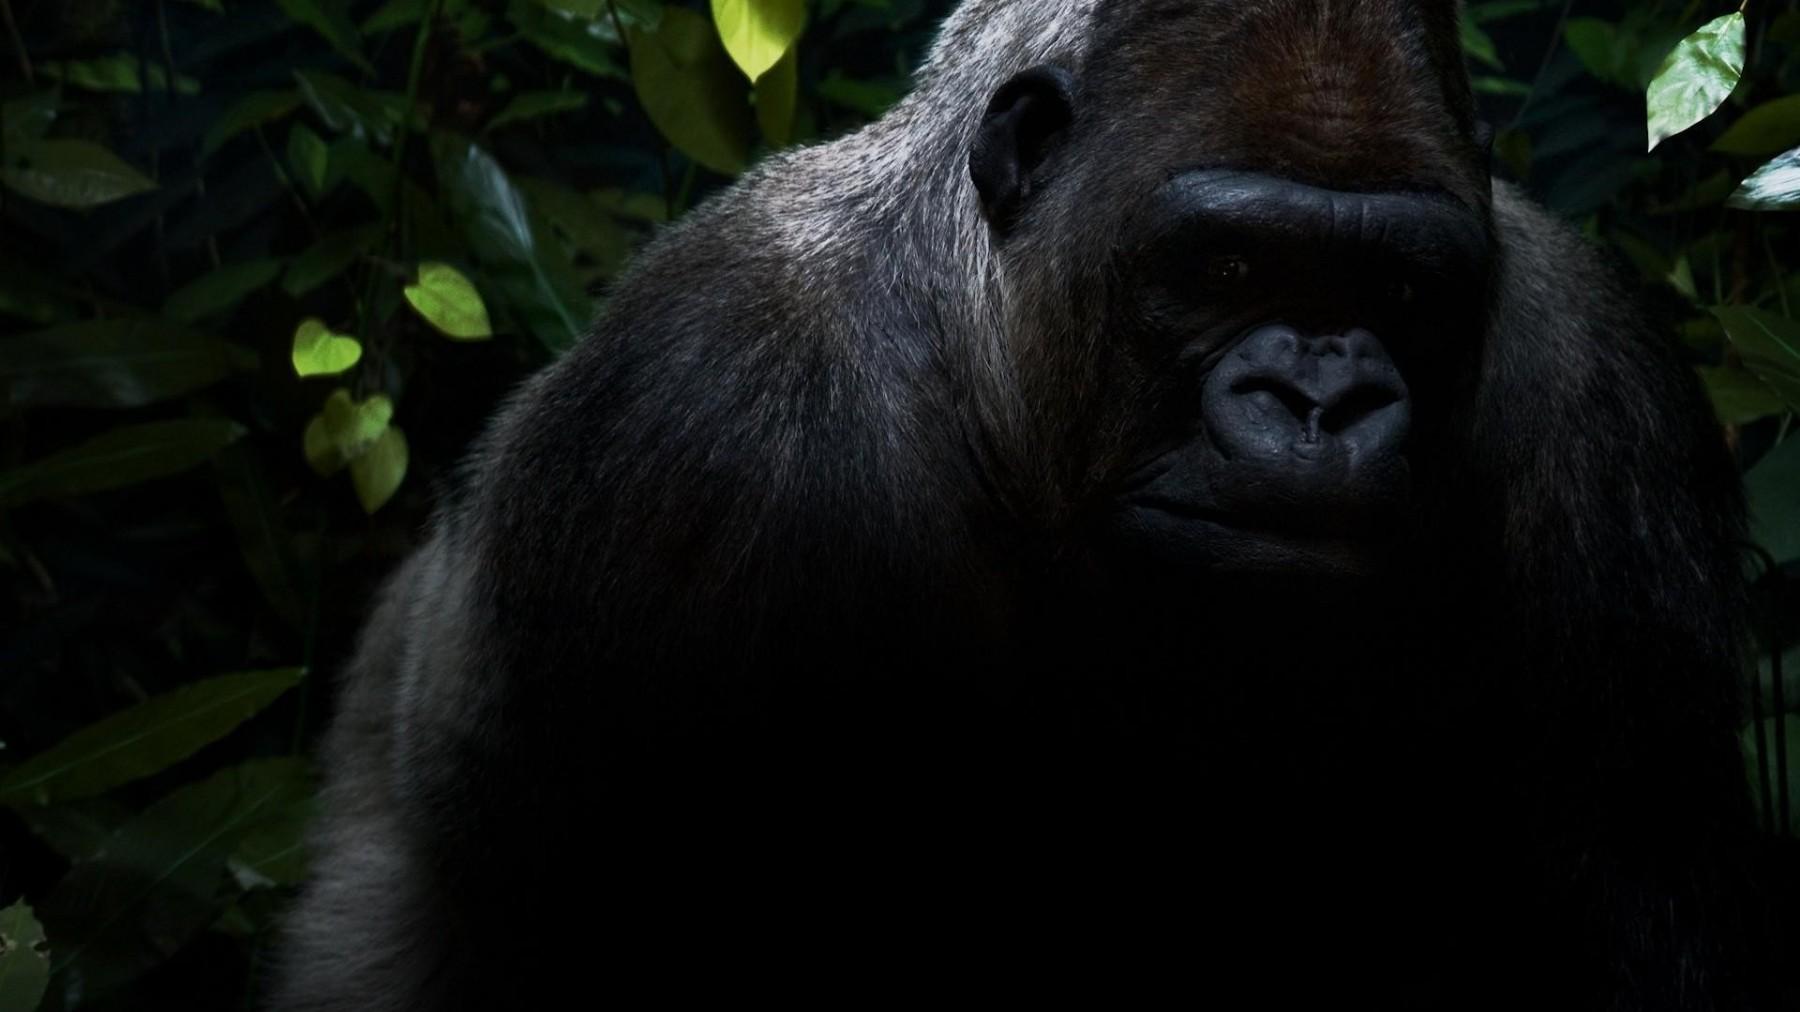 gorilla pic, gorilla eating